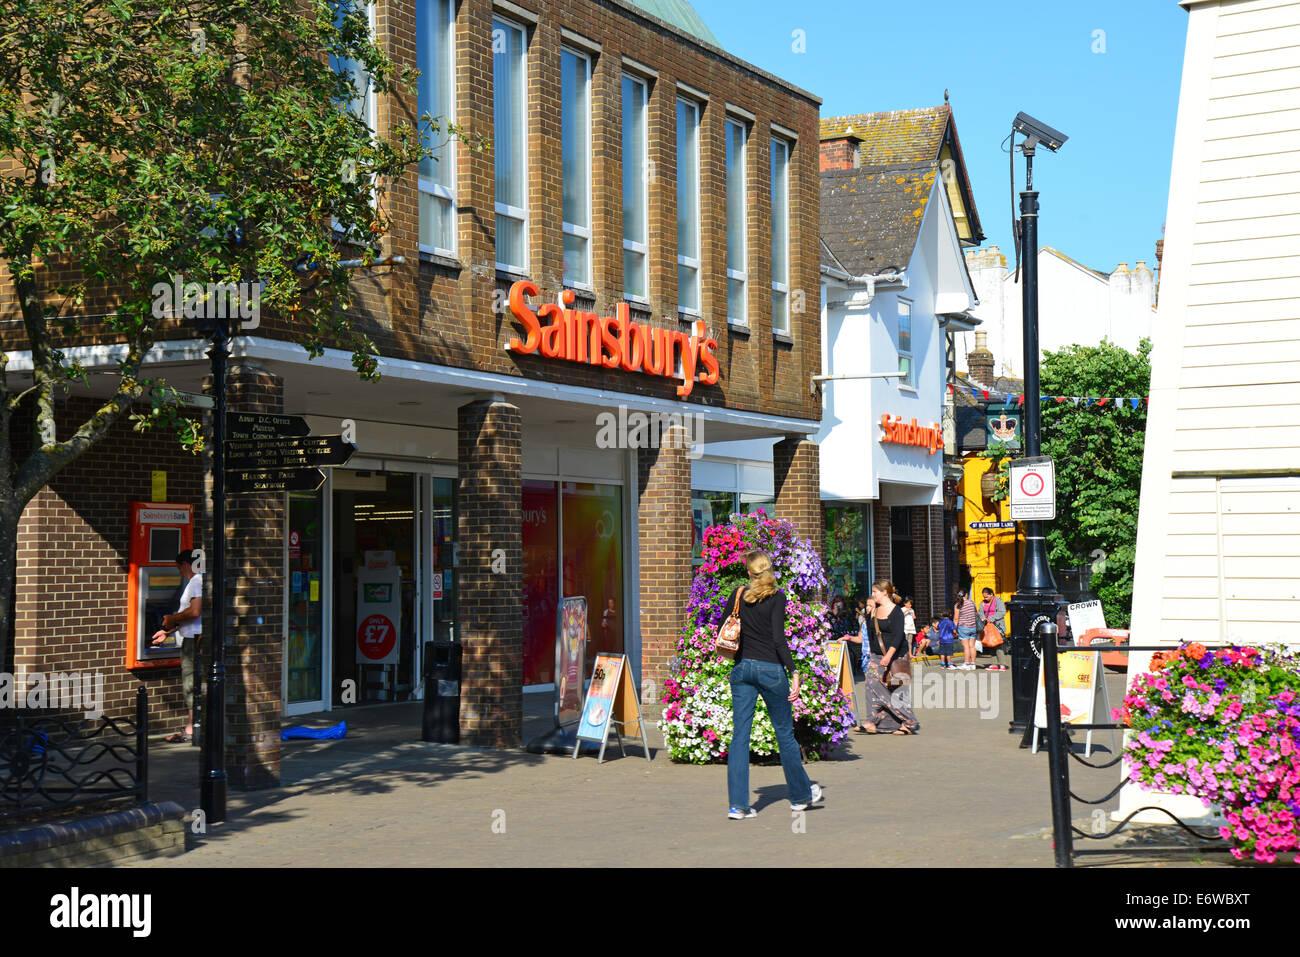 sainsburys-supermarket-high-street-littl